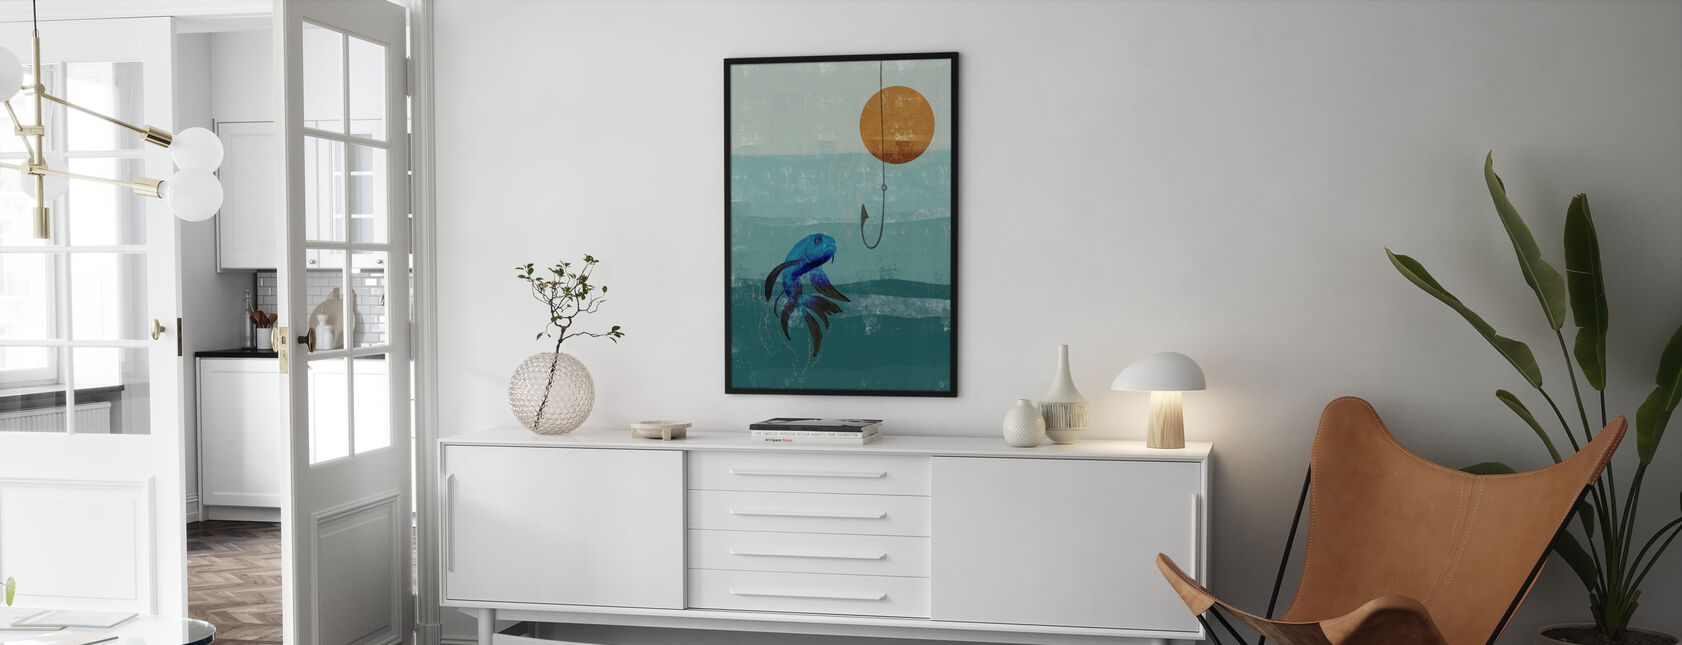 Fish Tank - Framed print - Living Room